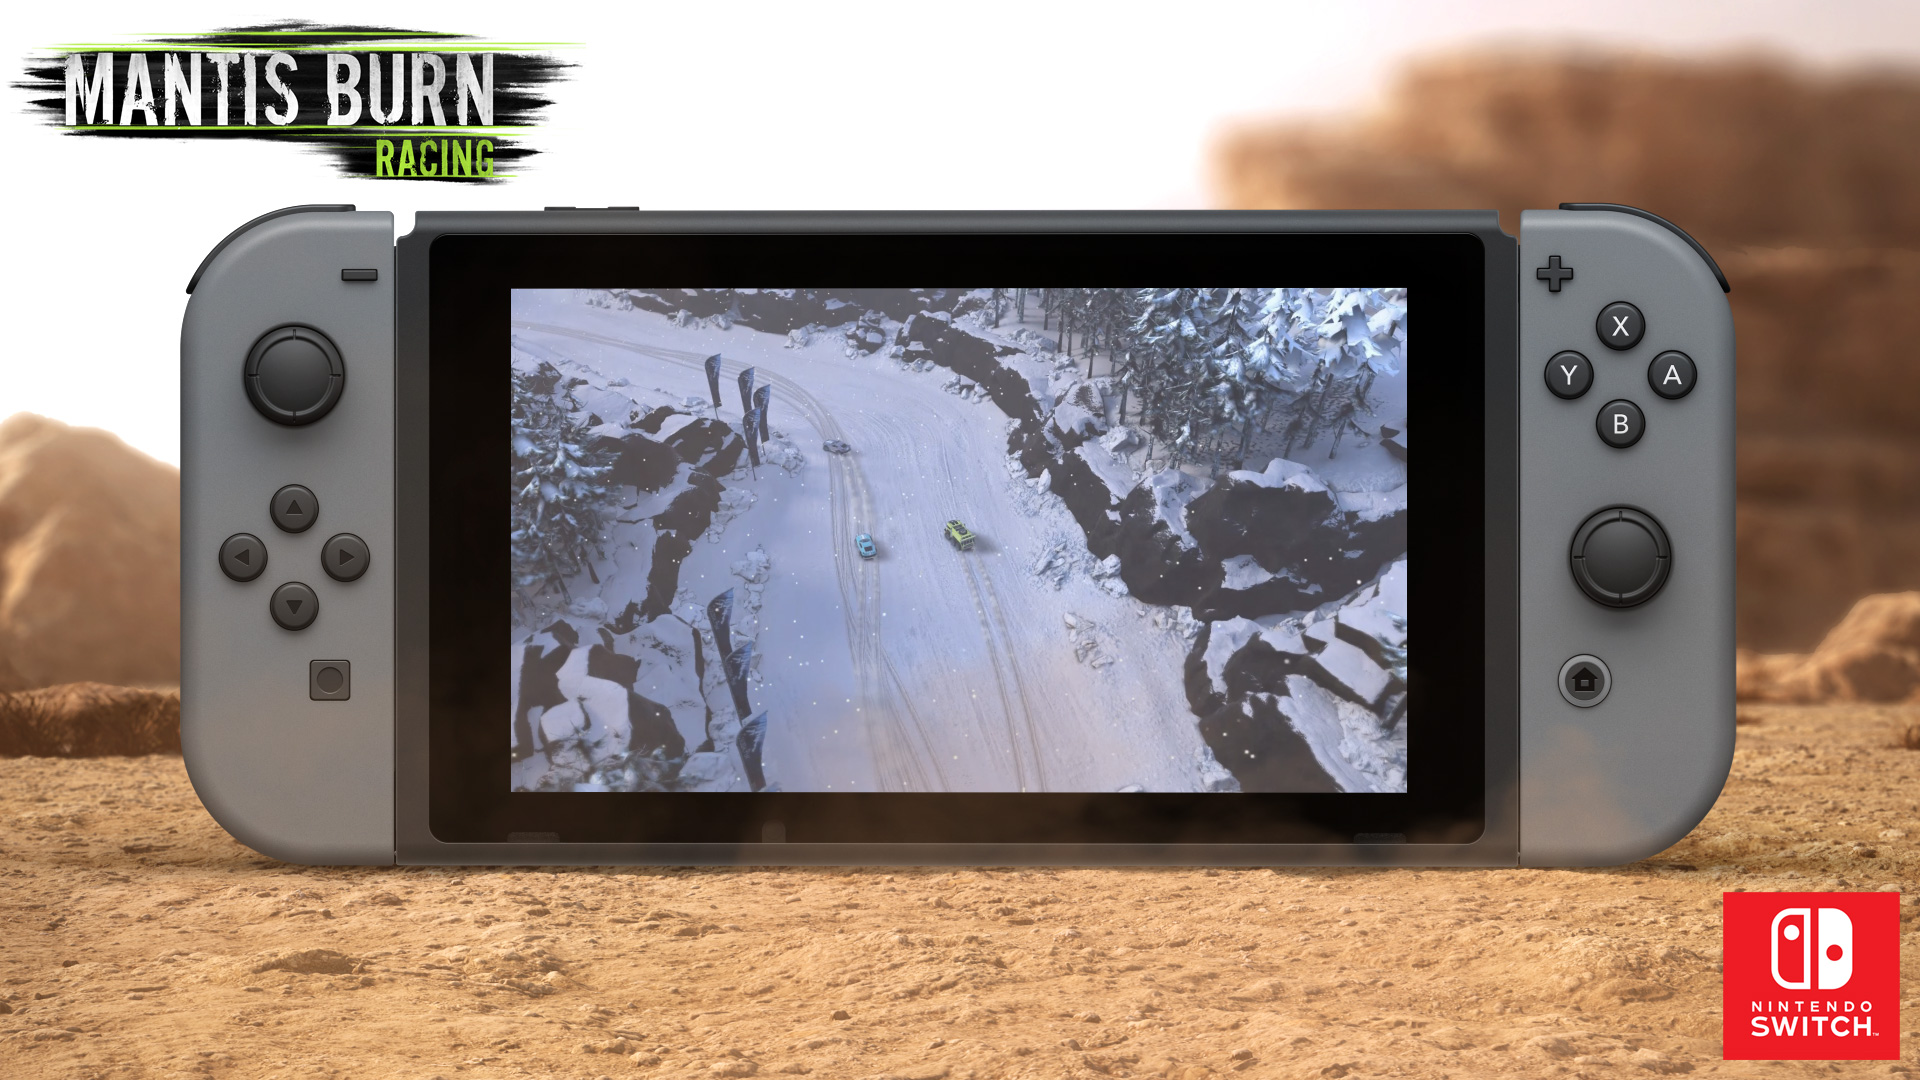 Mantis Burn Racing will run at 60fps on Nintendo Switch